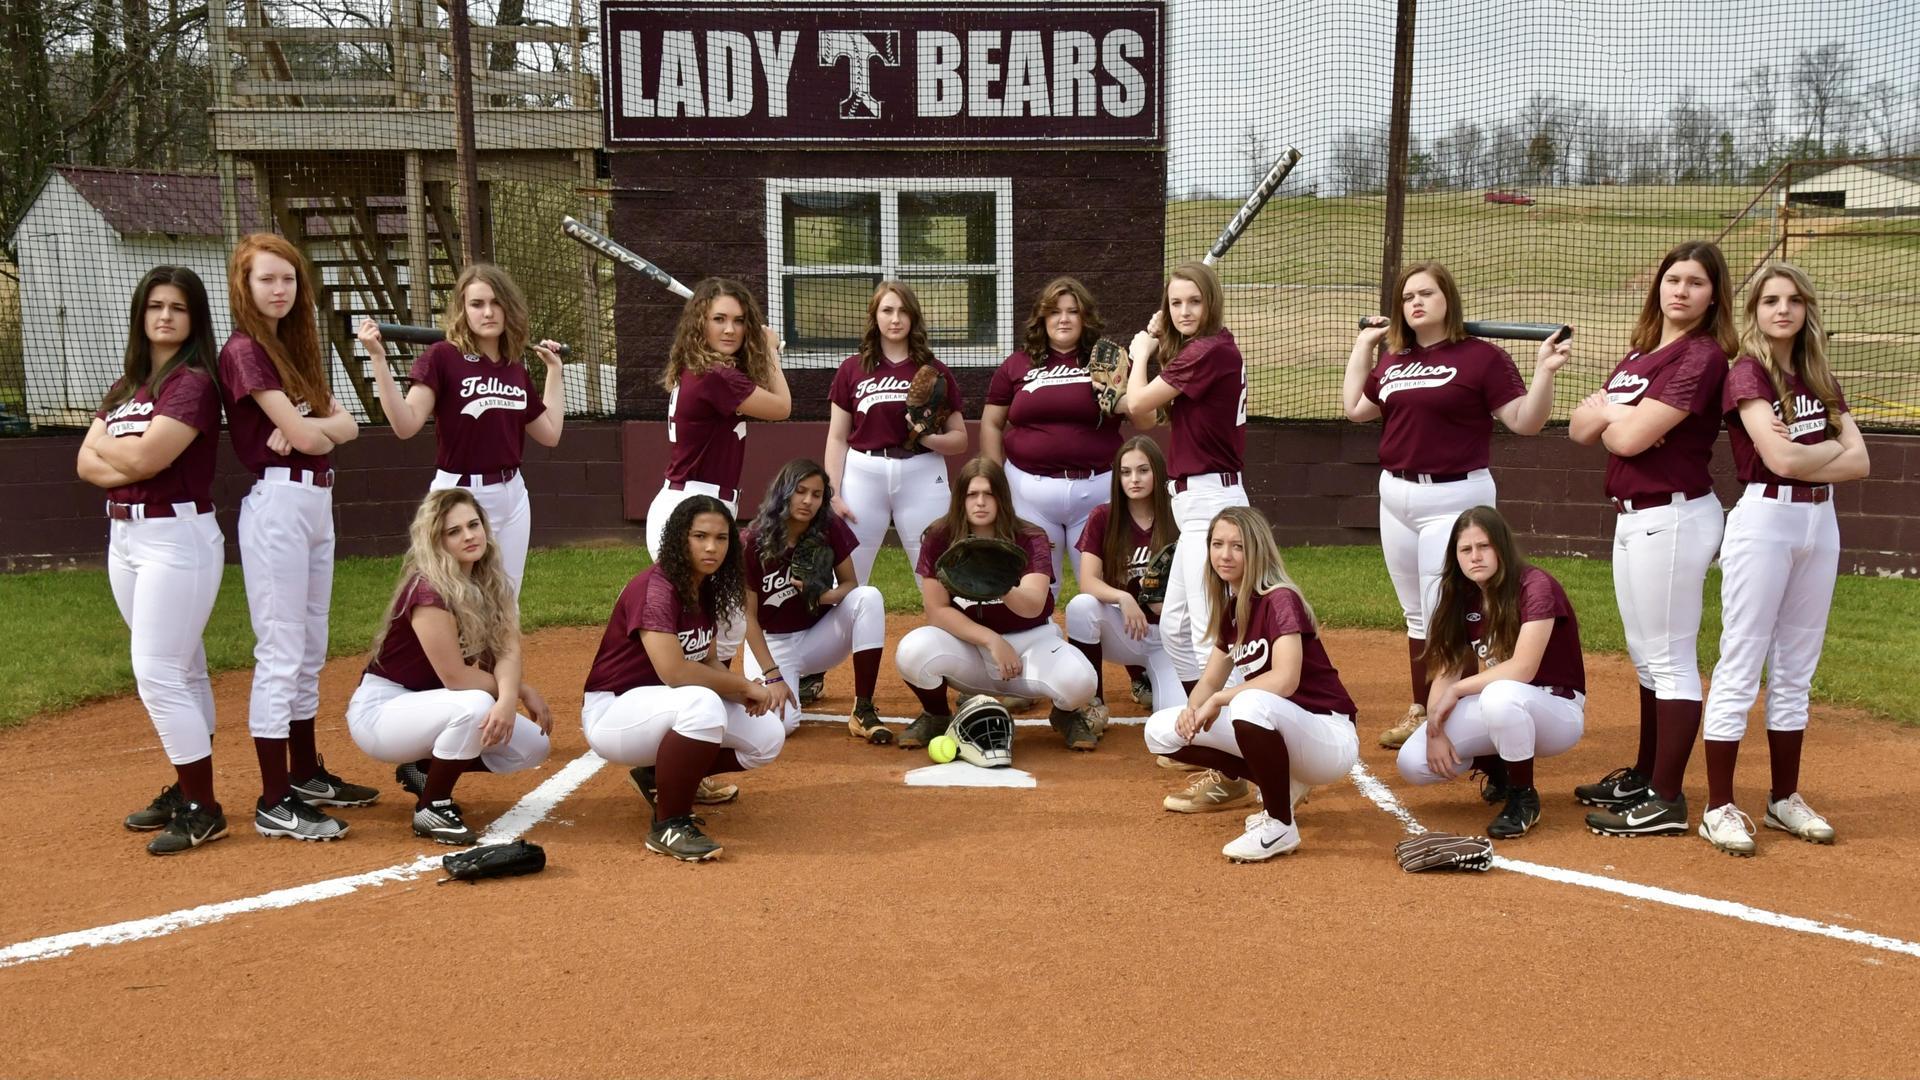 2021 Lady Bears Softball Team